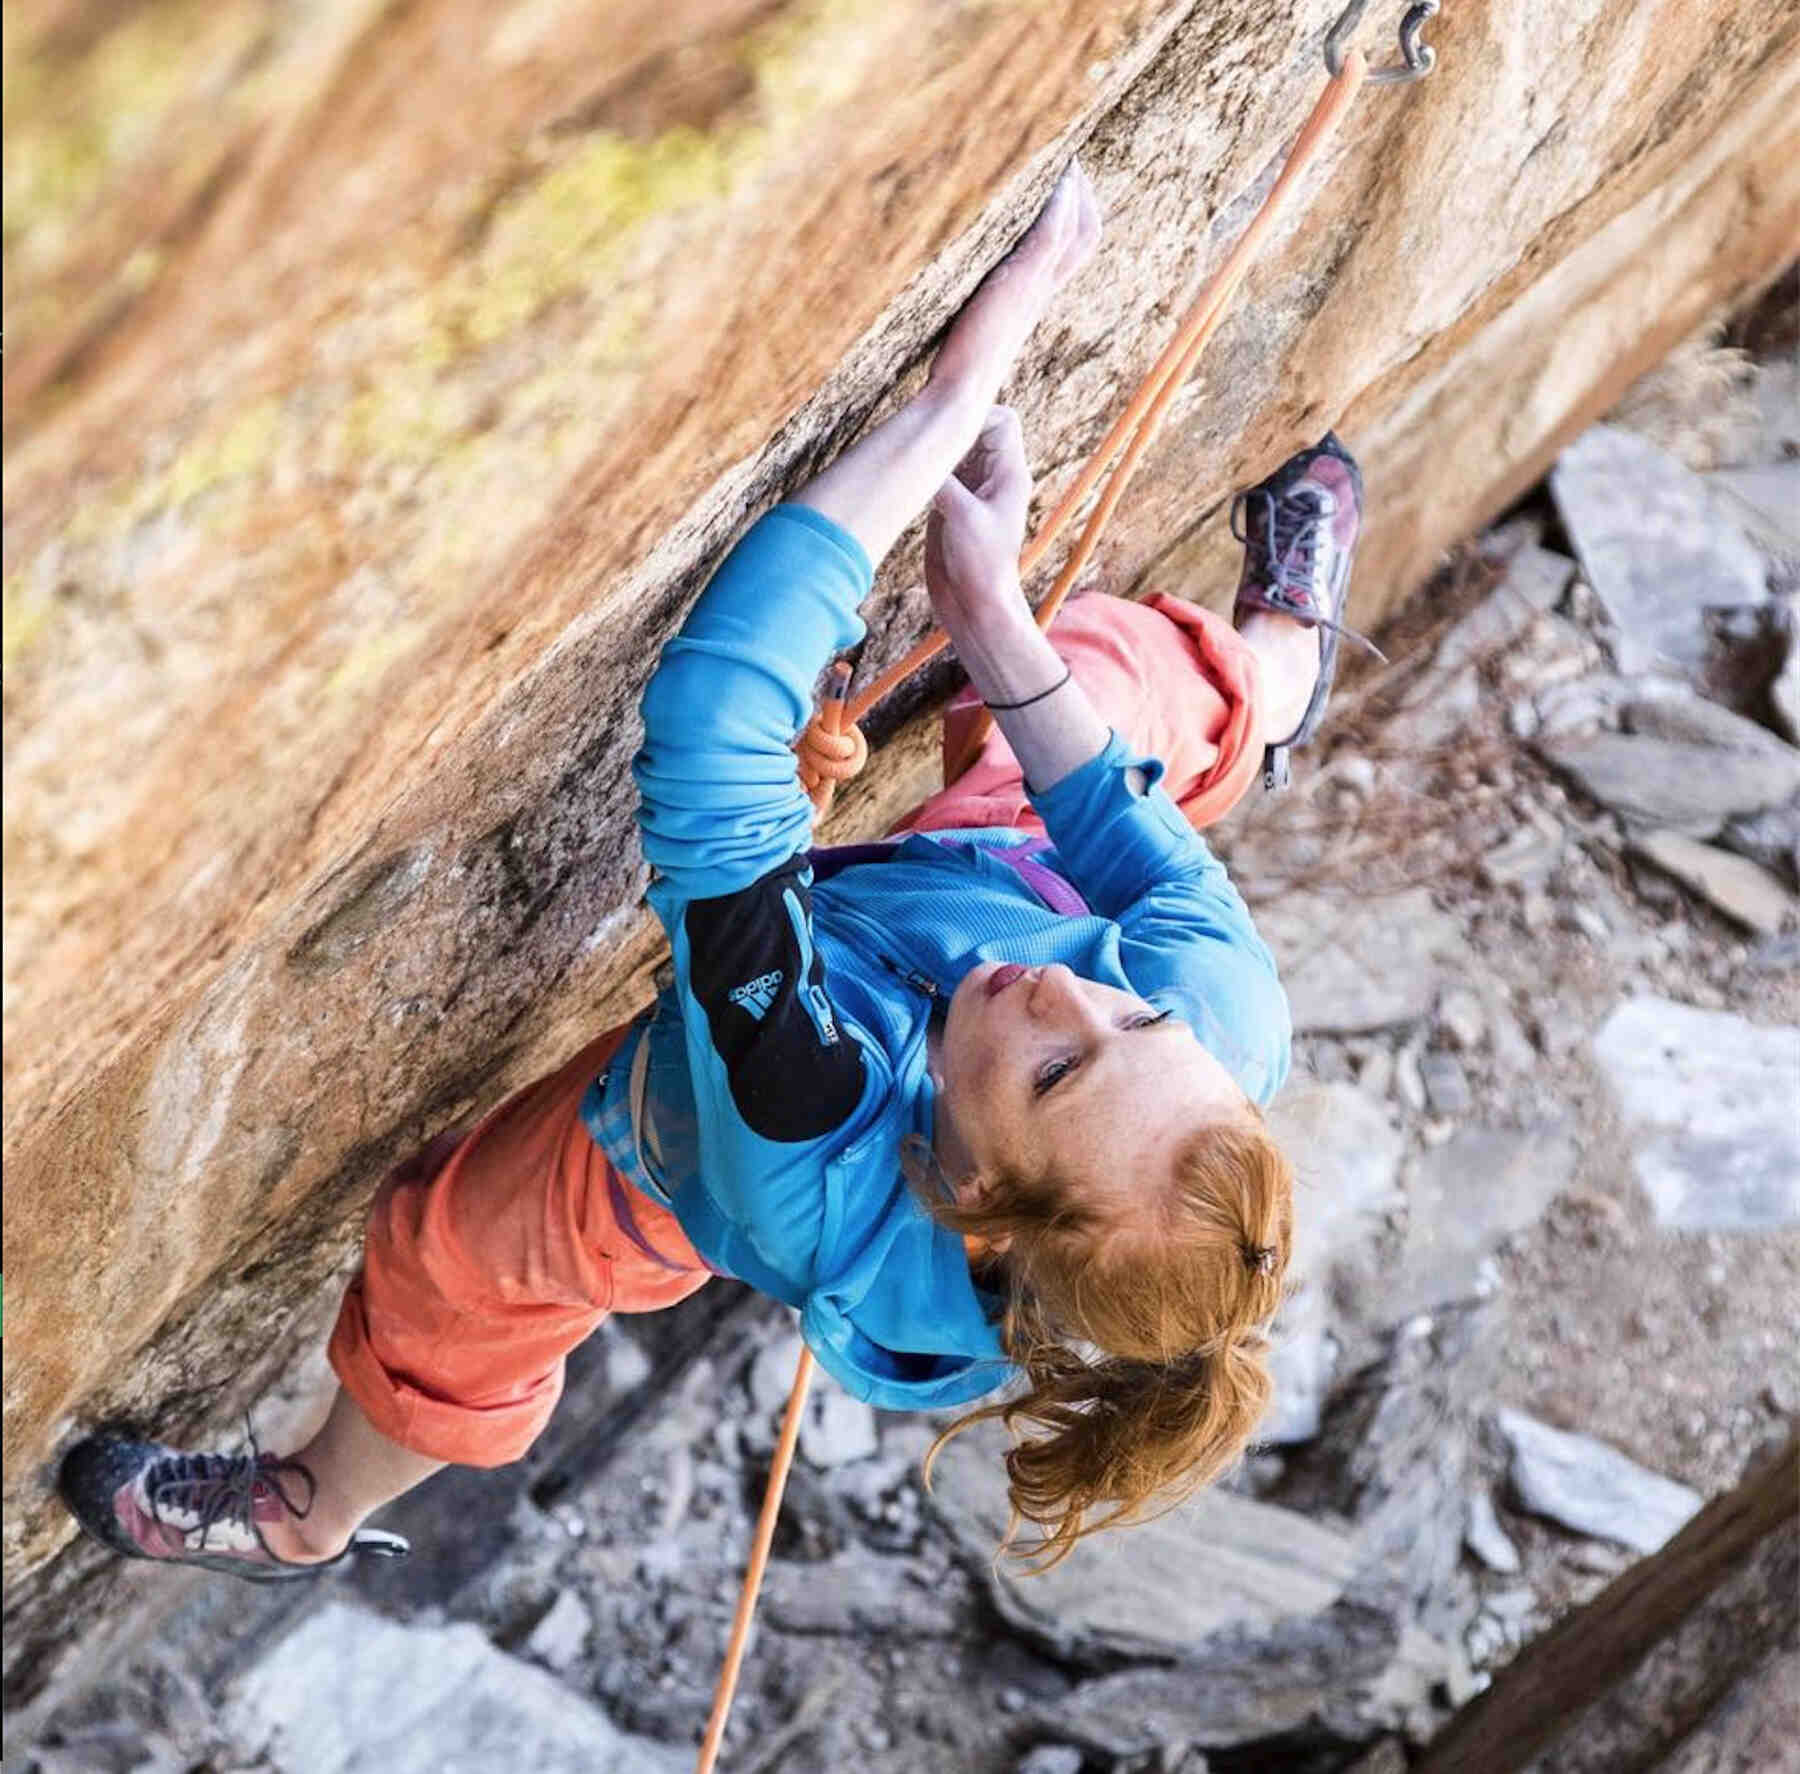 Delaney Miller - FrictionLabs Rock Climbing Chalk Pro Athlete